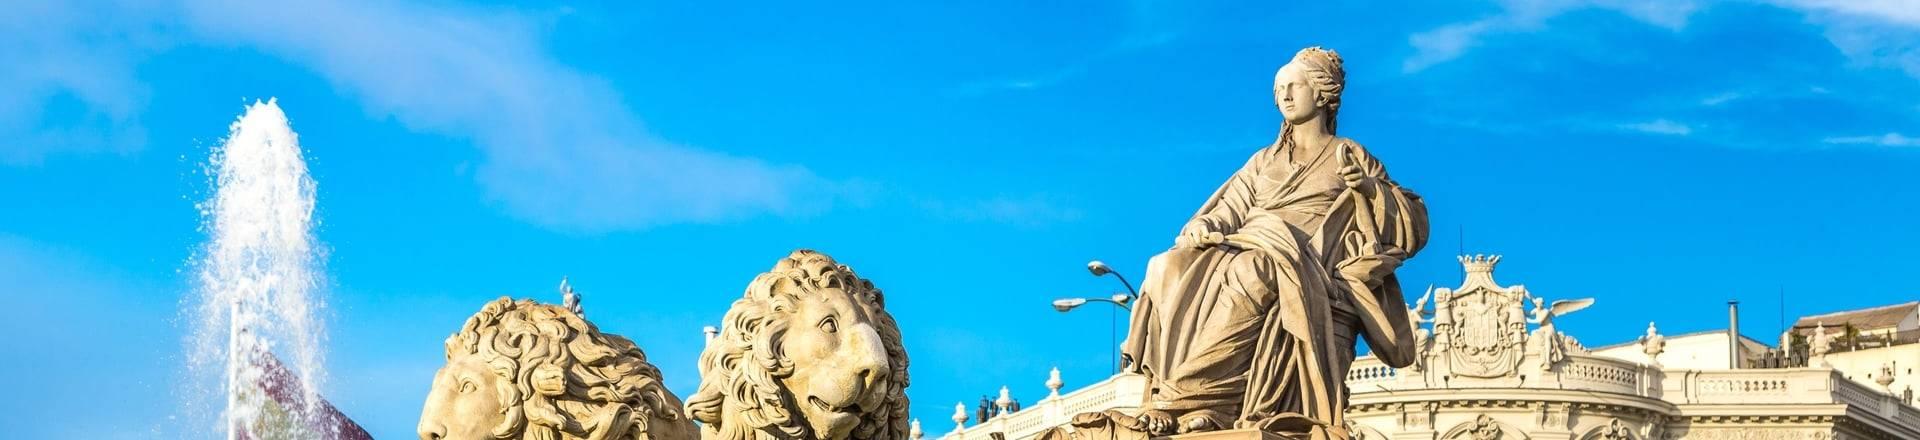 Hoteles en Madrid centro baratos desde 13  Destinia